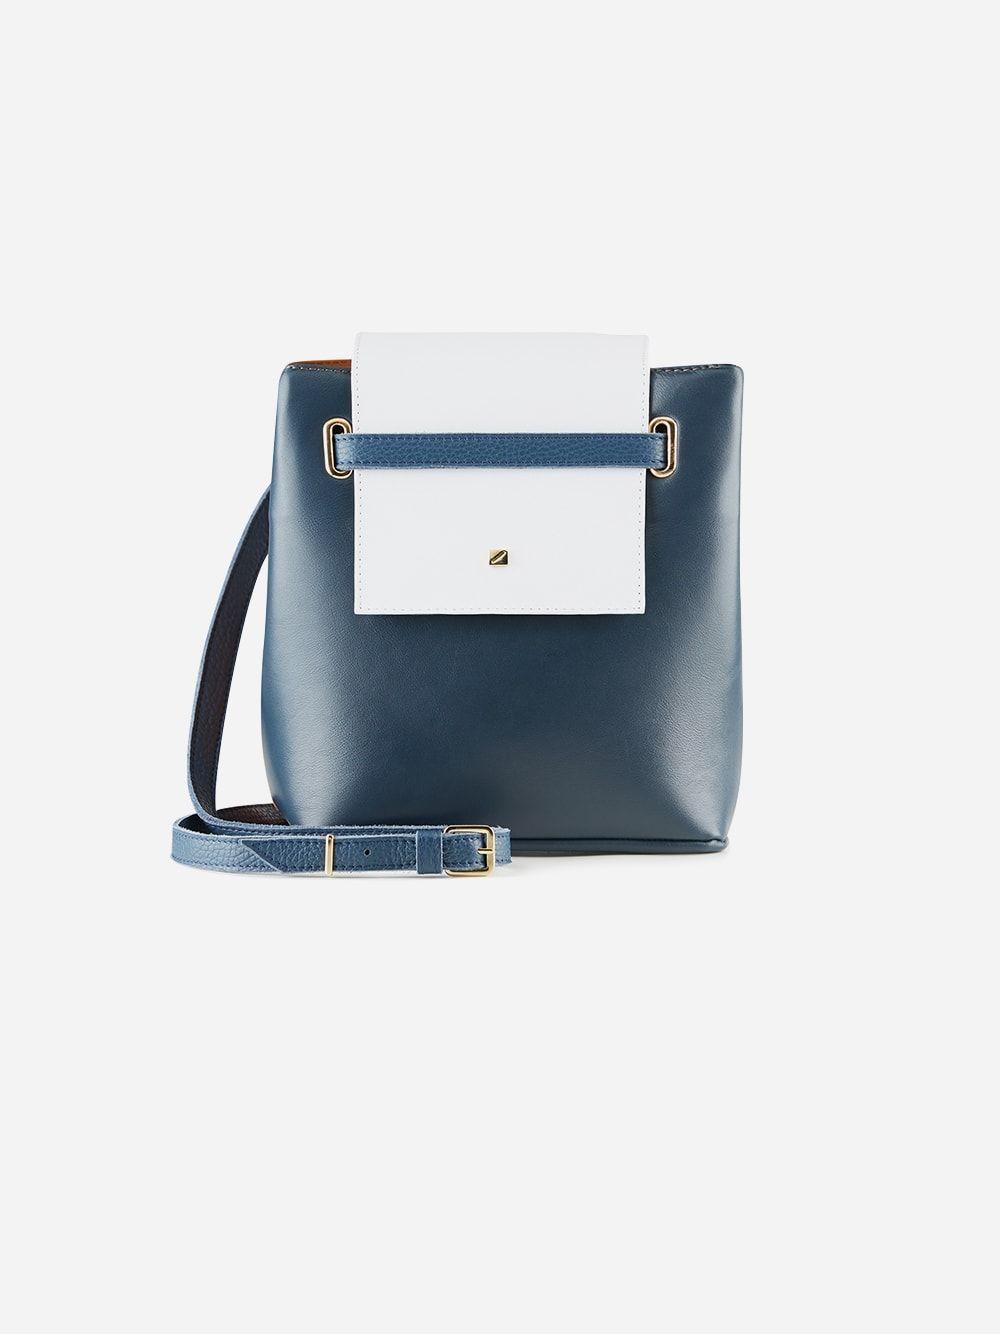 Navy Blue and Brown Mini Bucket Bag   Maria Maleta